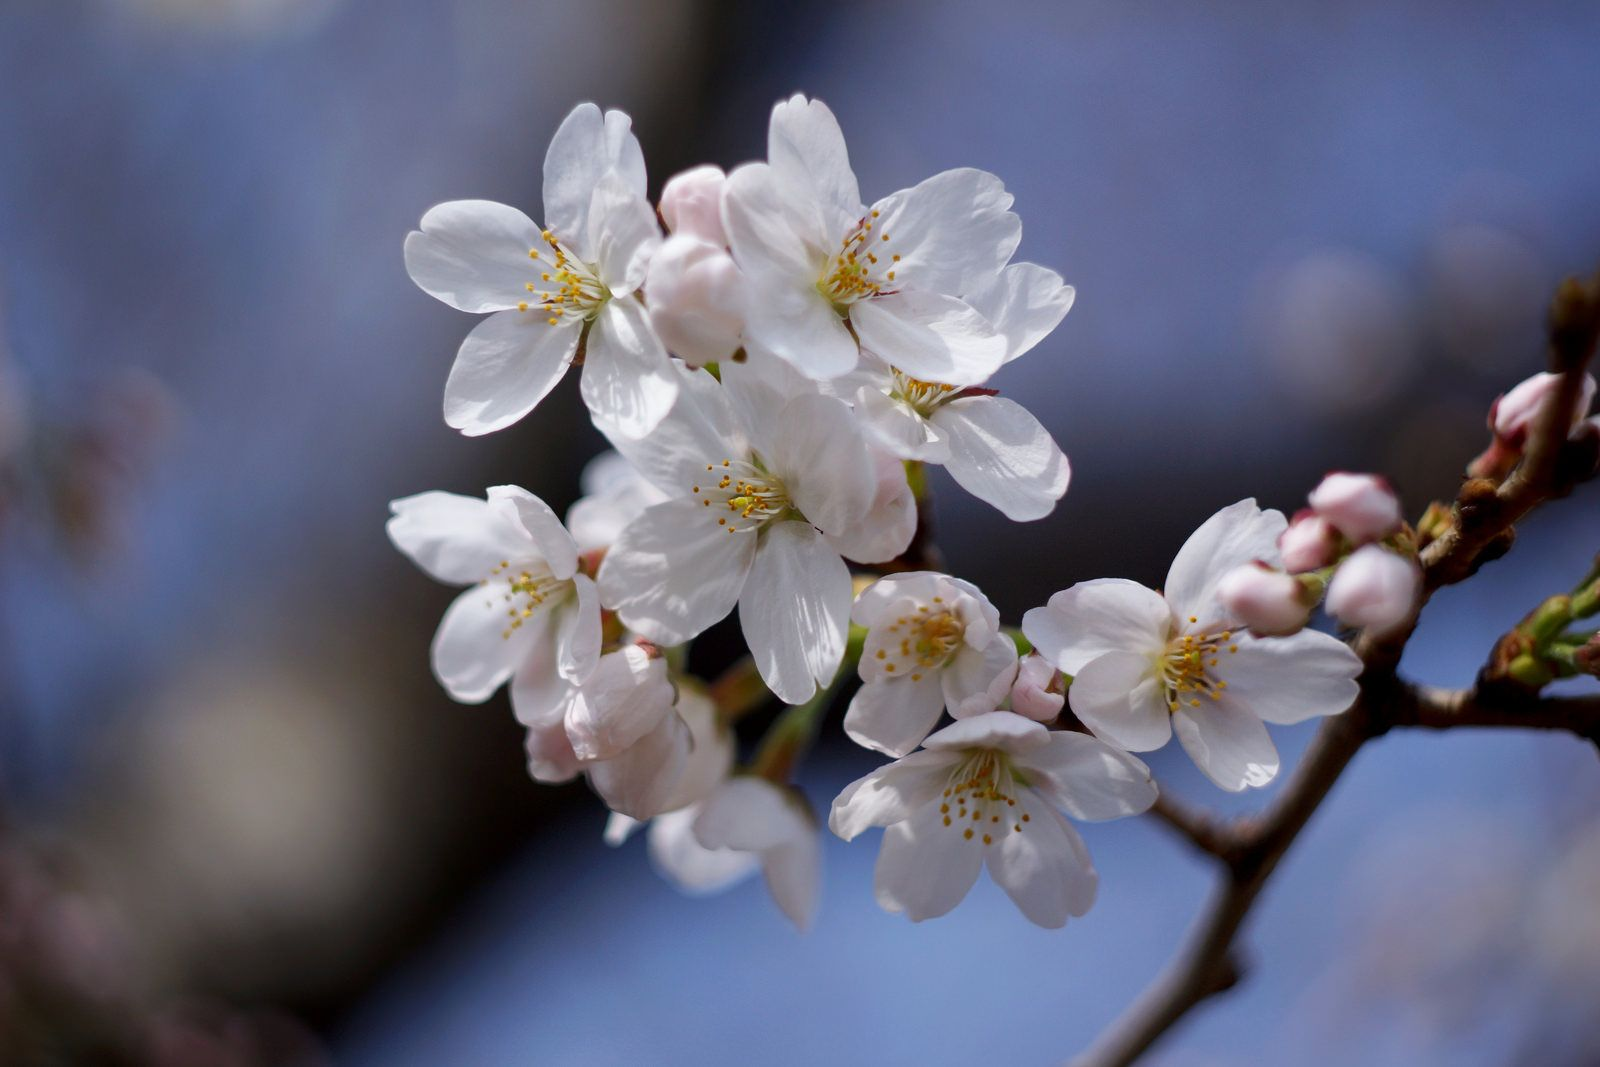 Somei Yoshino Cherry Blossom Cherry Blossom Wallpaper Cherry Blossom Season Cherry Blossom Background